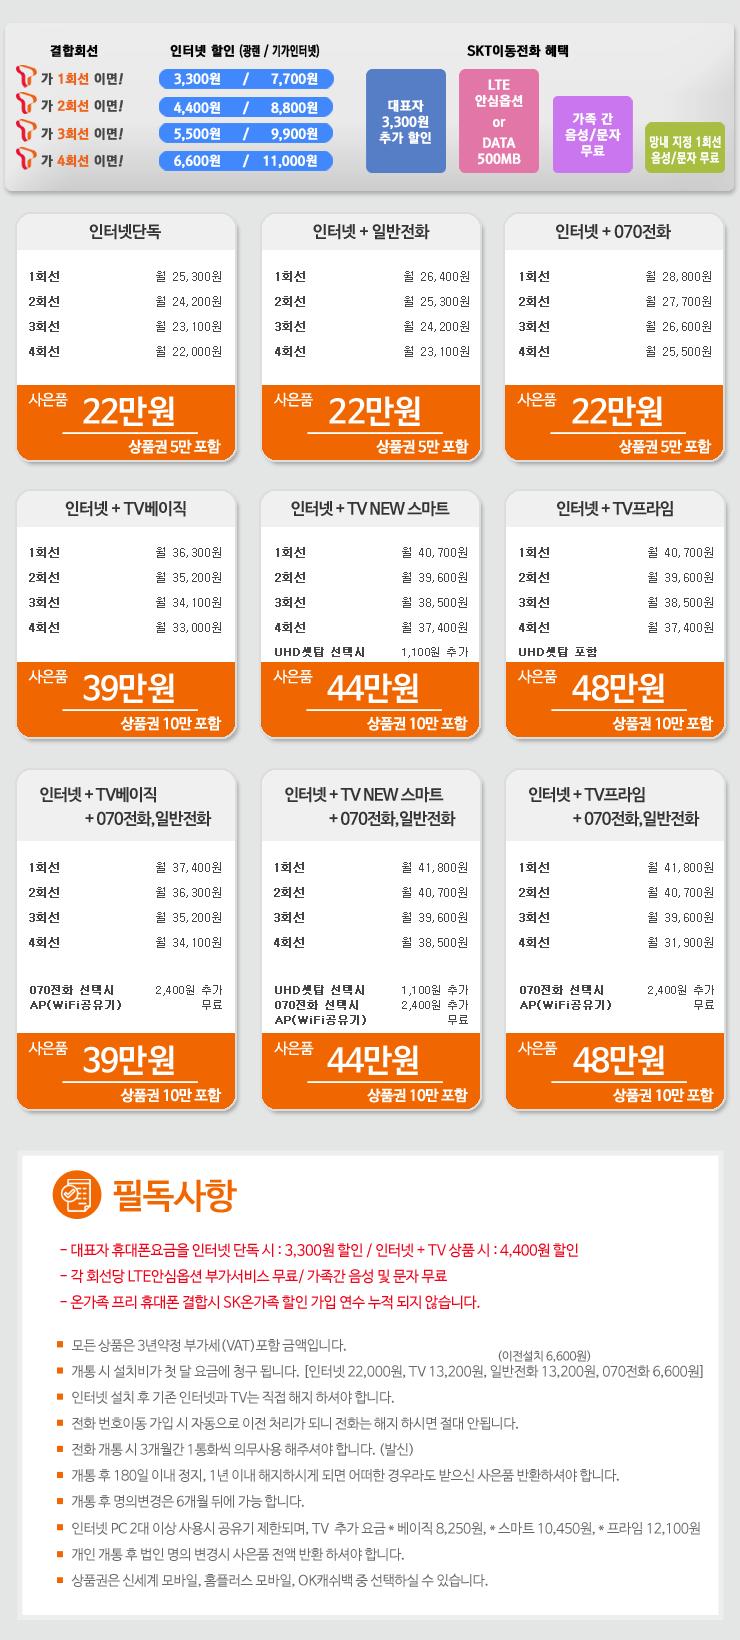 SK_broadband_free_500m_740.png